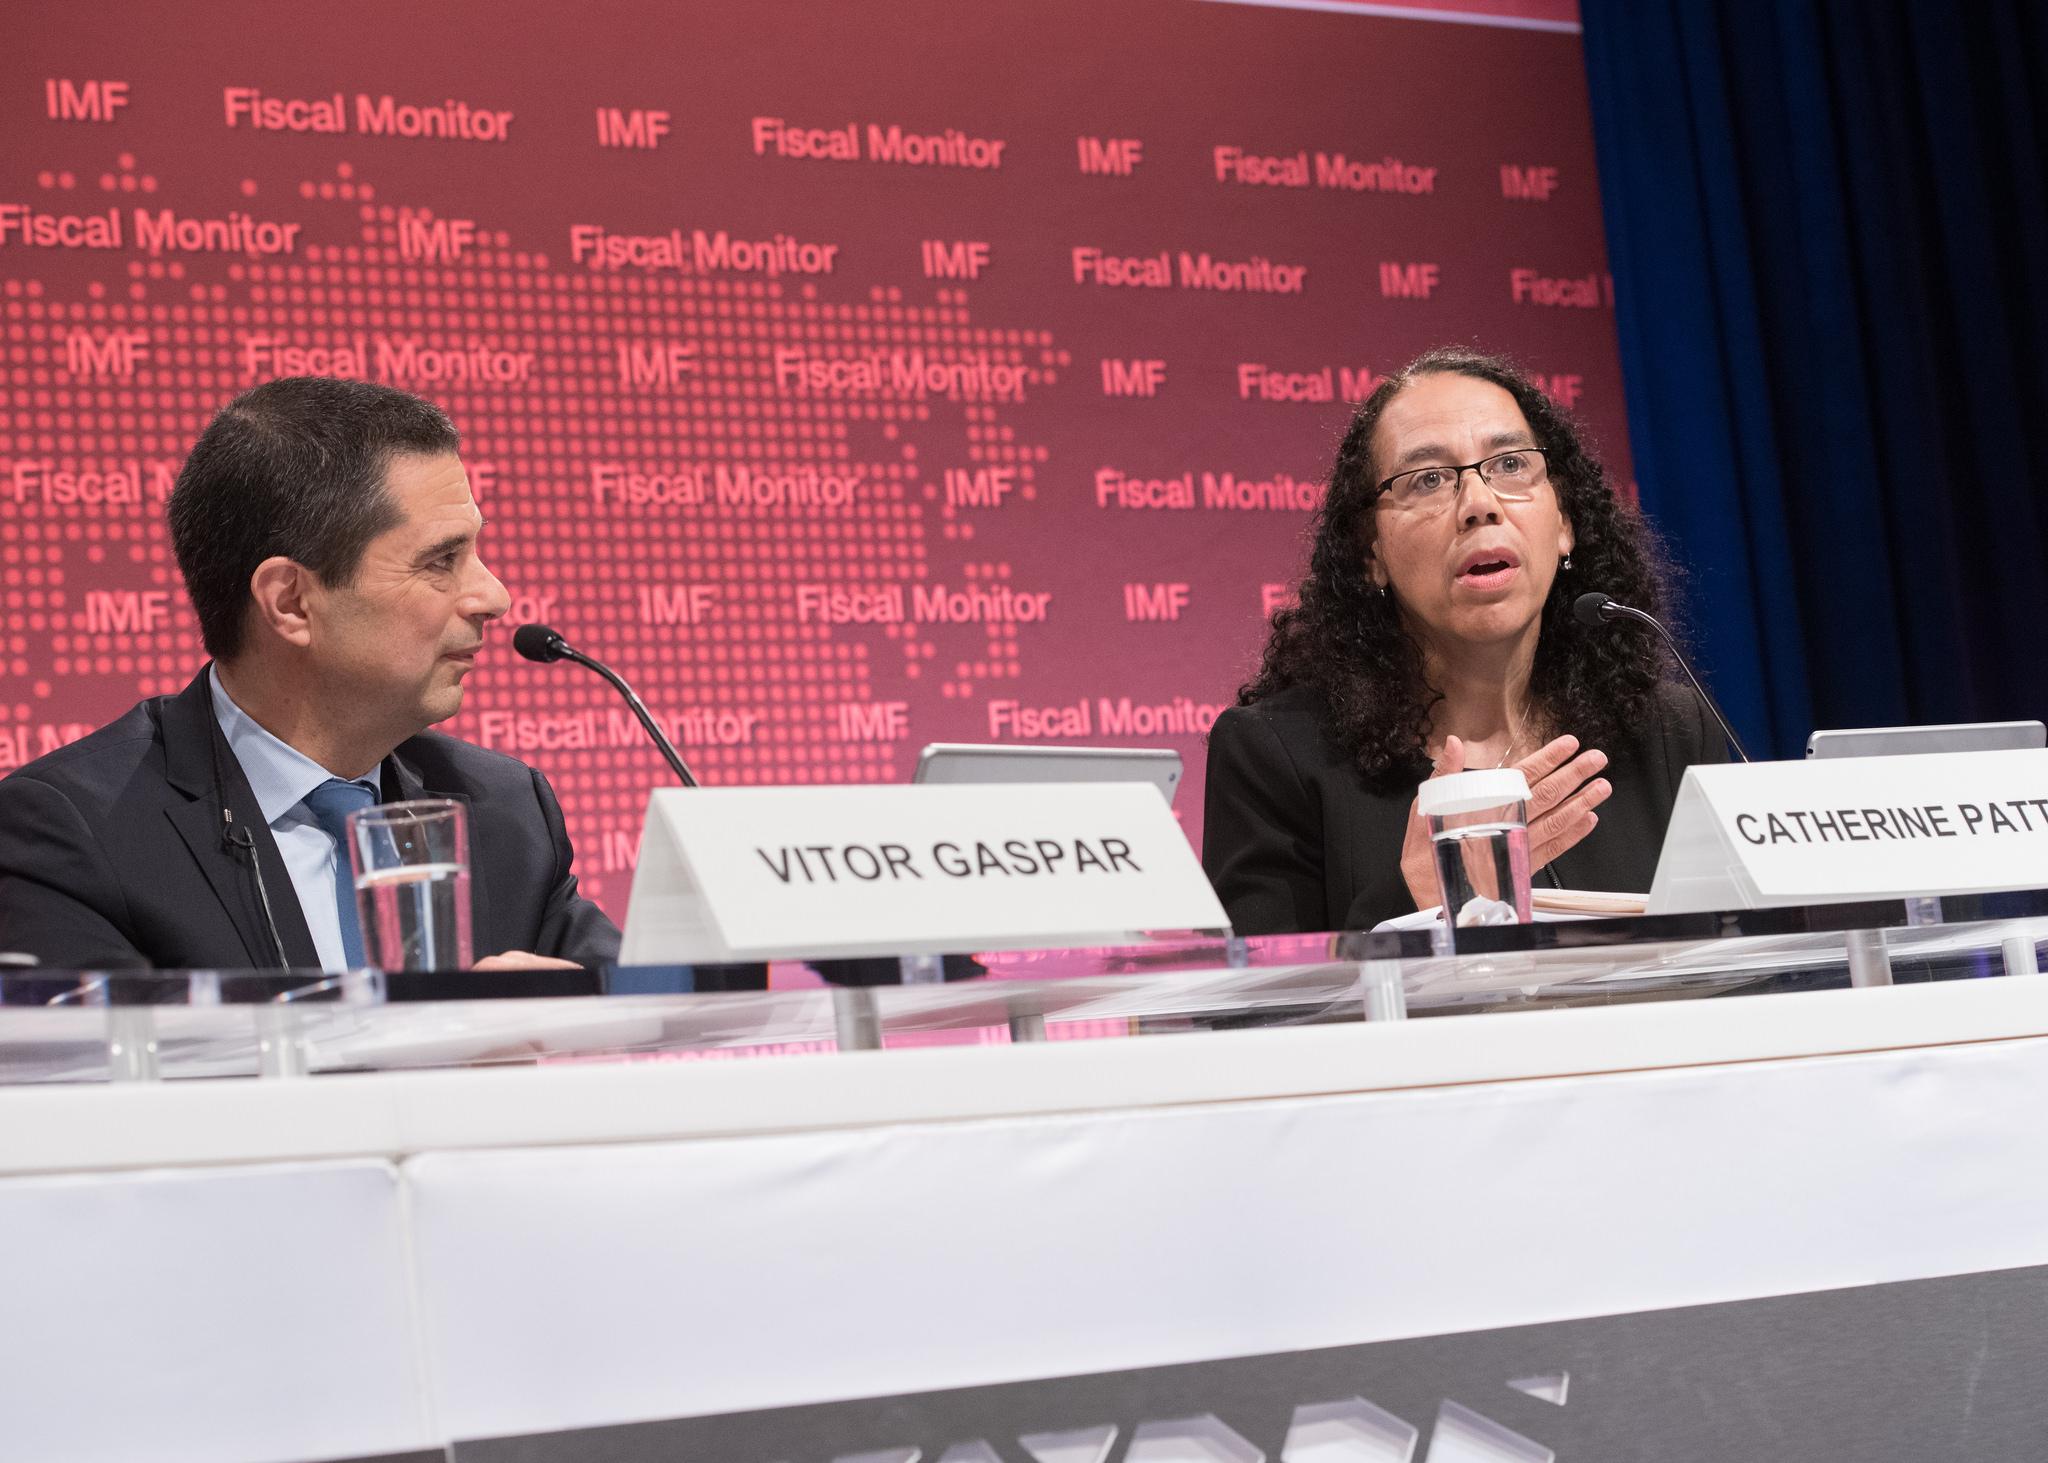 IMF Vitor and Catherine Patillo